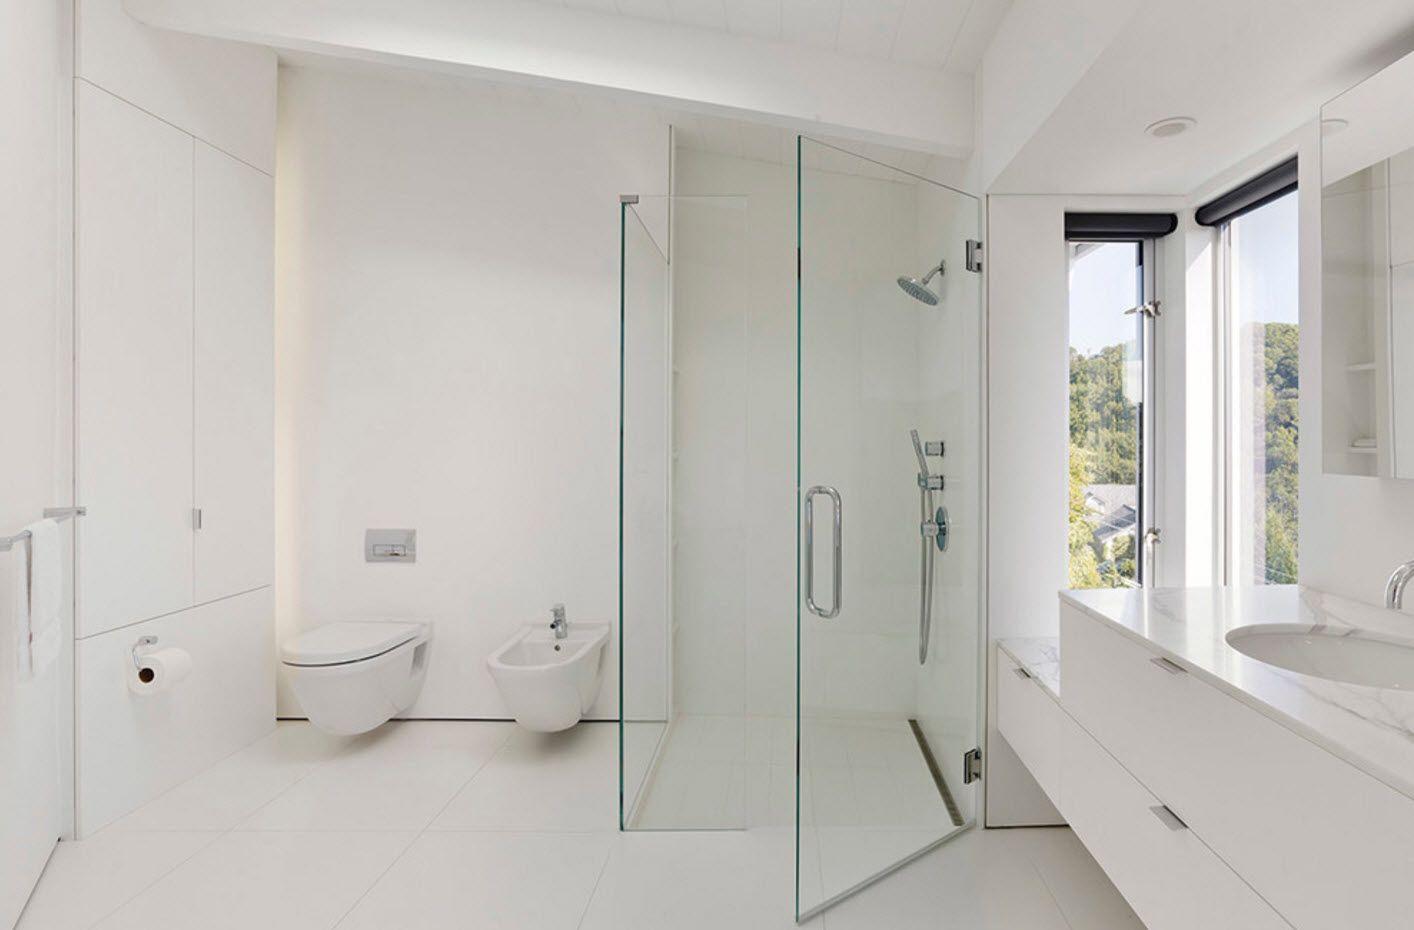 Bathroom Design Trends & Decoration Ideas 2017 - Small Design Ideas